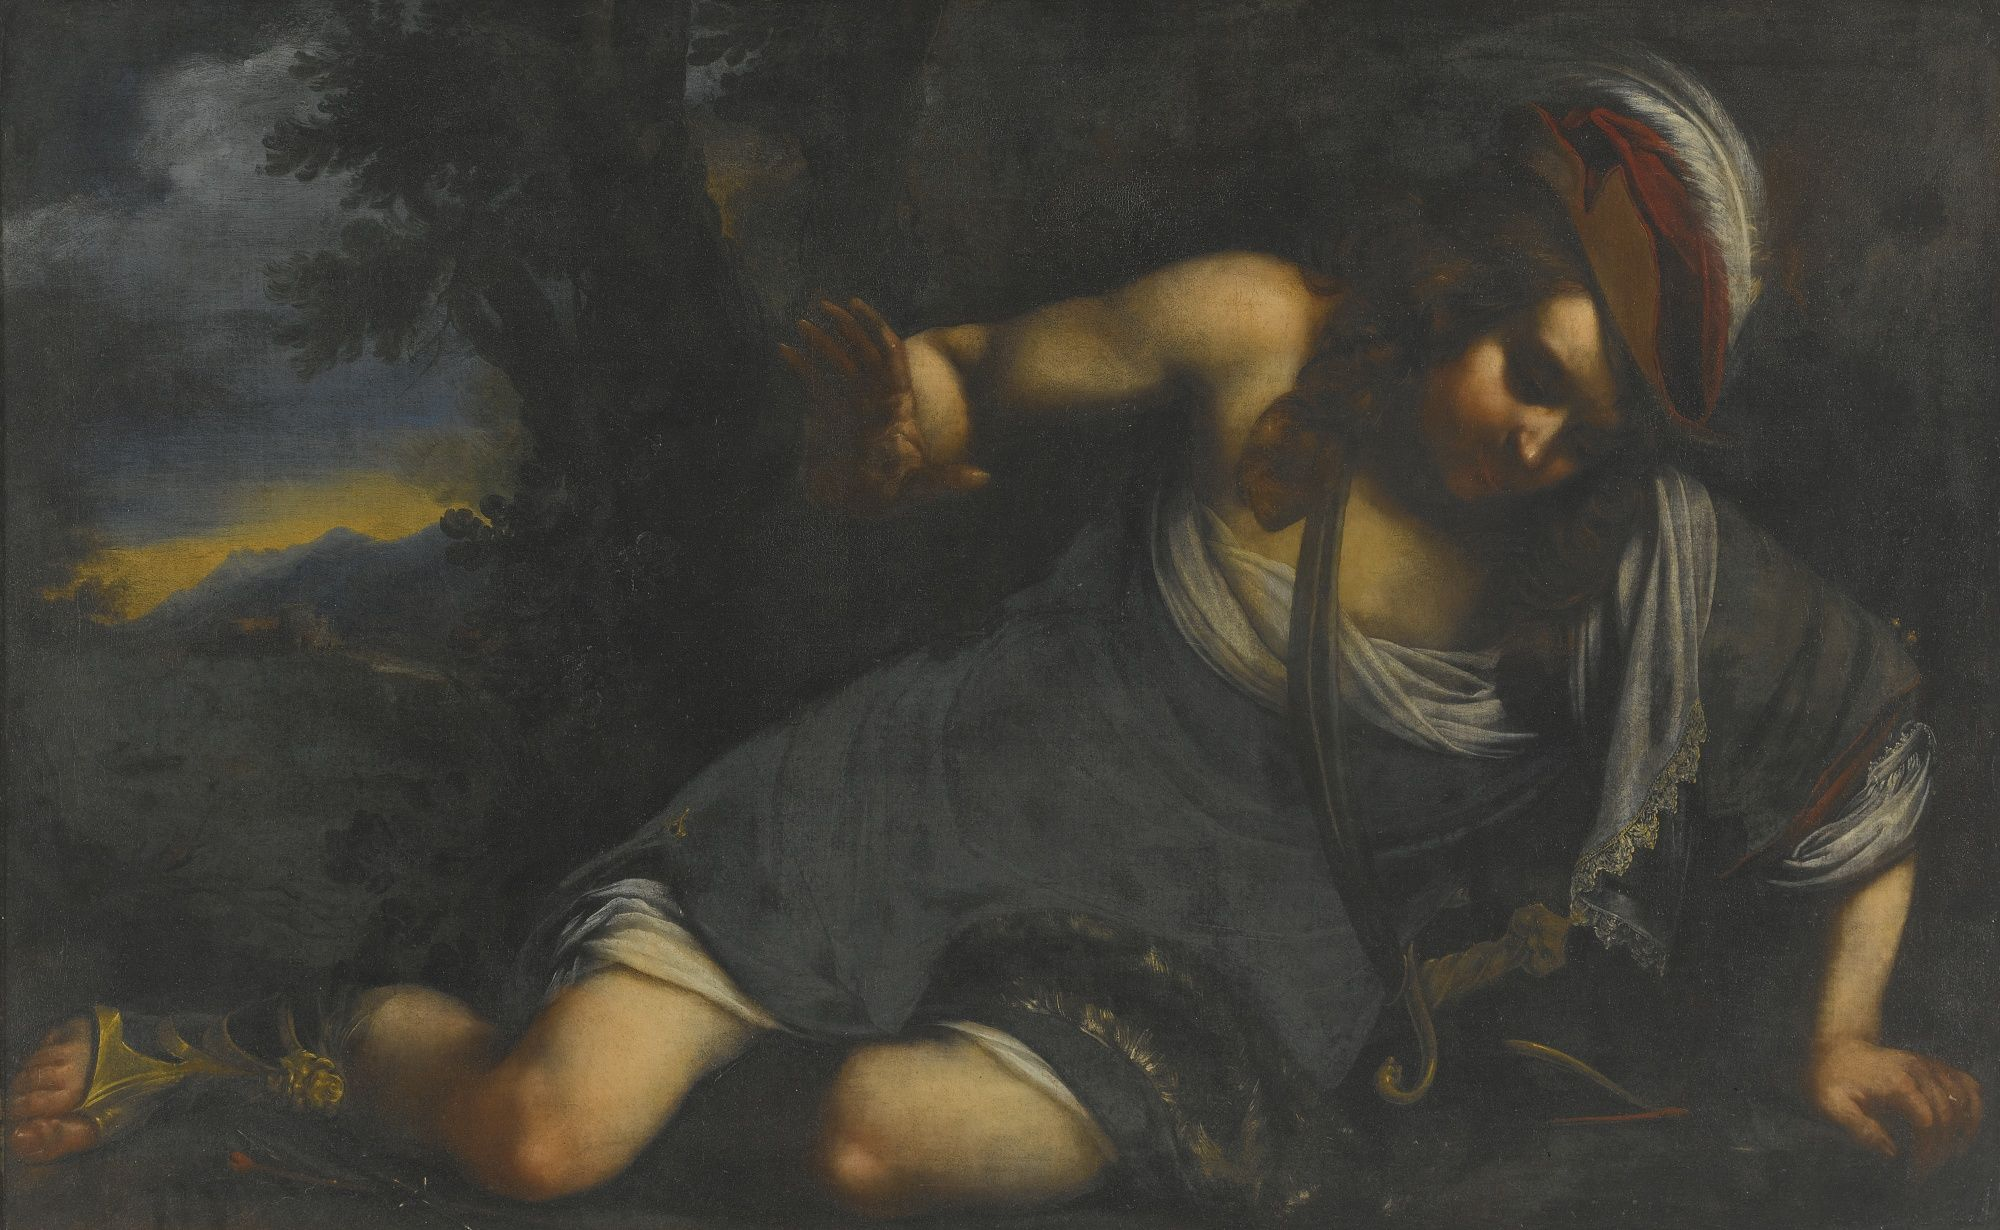 Attributed To Francesco Furini Lot Sotheby S Greek Heroes Sothebys Francesco